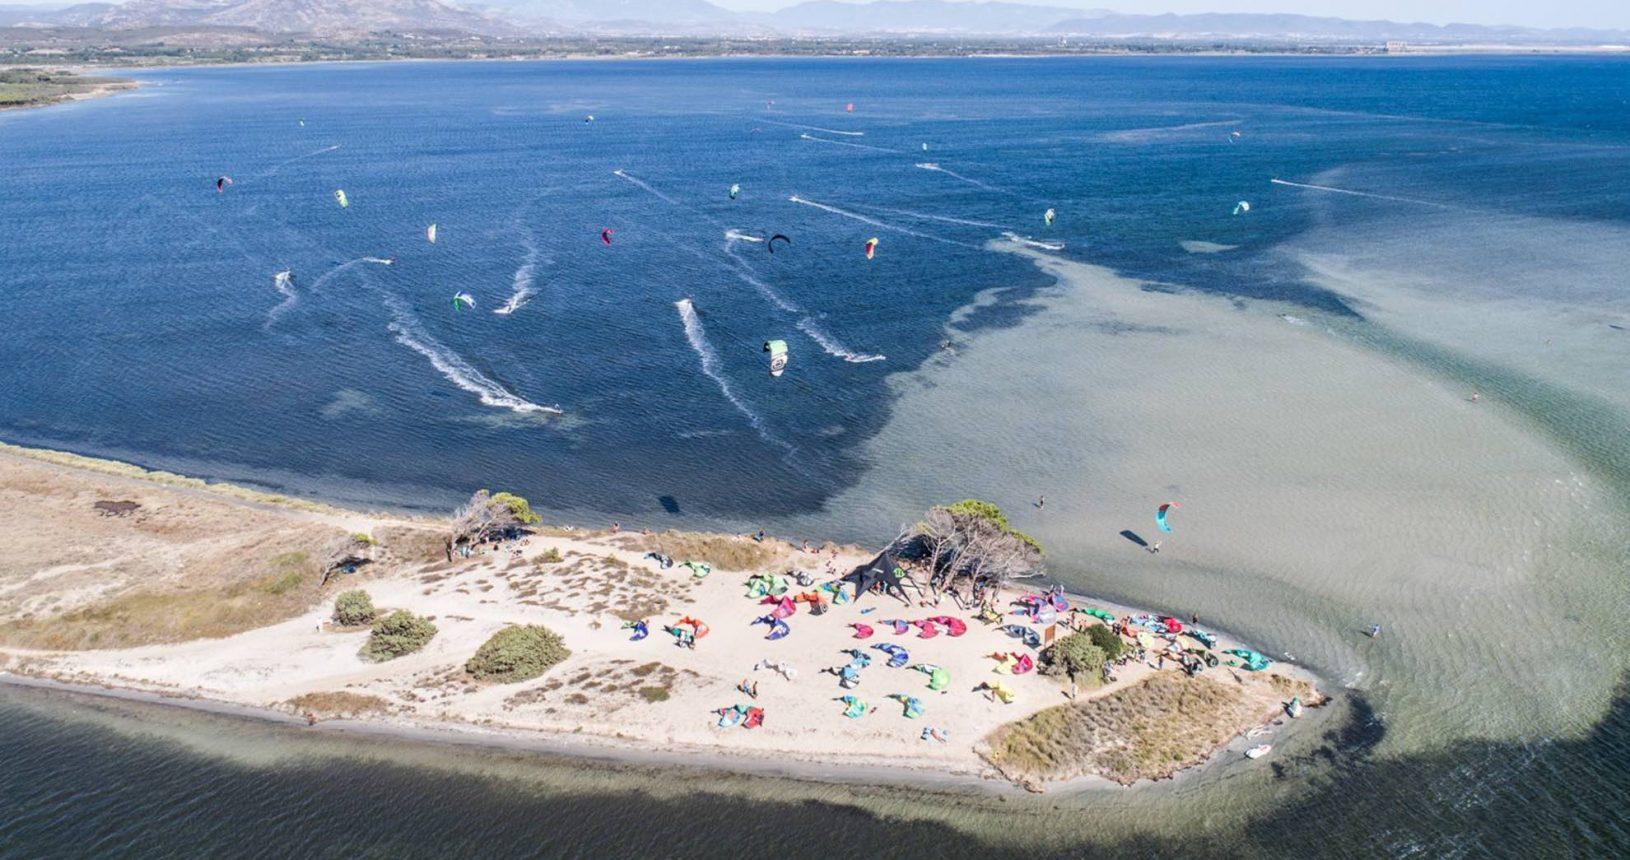 visione aerea del kitesurf spot di punta trettu